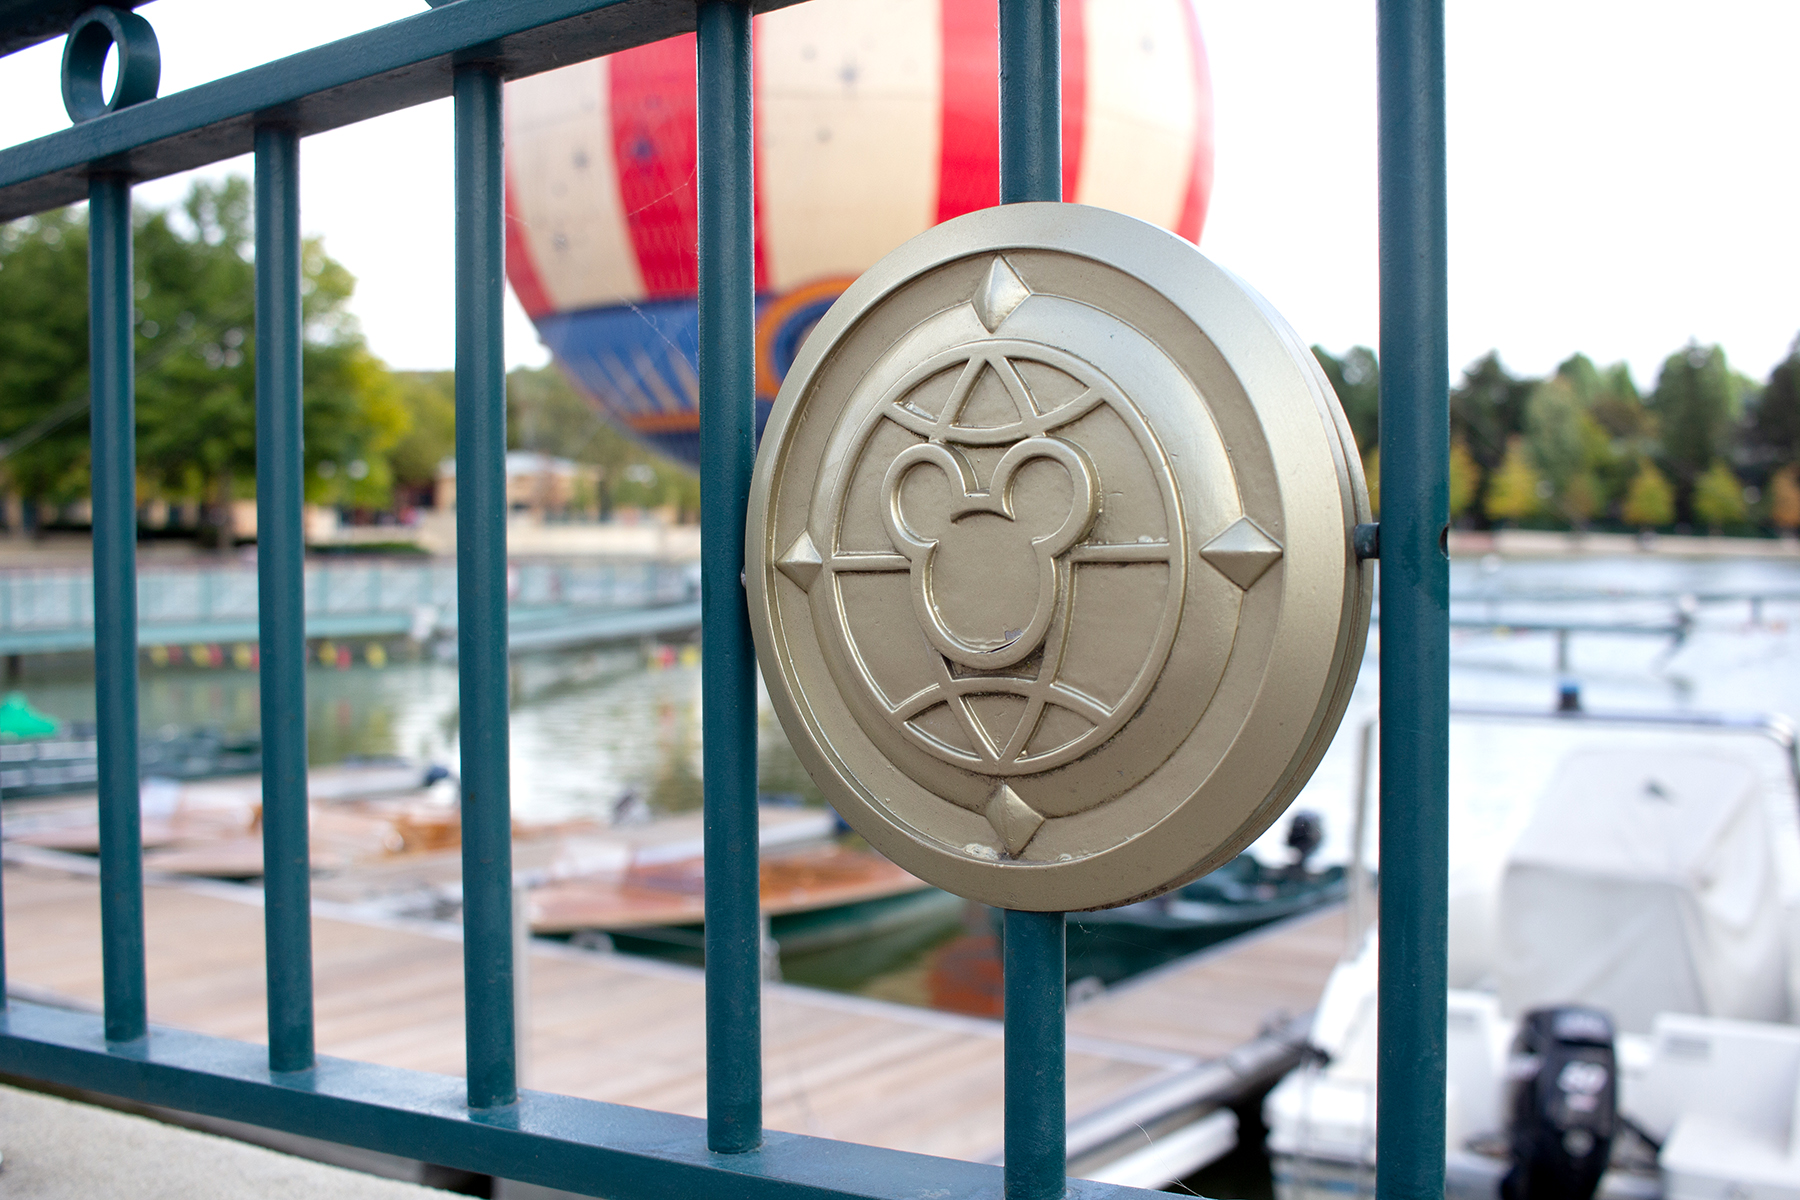 Hidden Mickey symbol on fence  | 9 Tips for Disneyland Paris